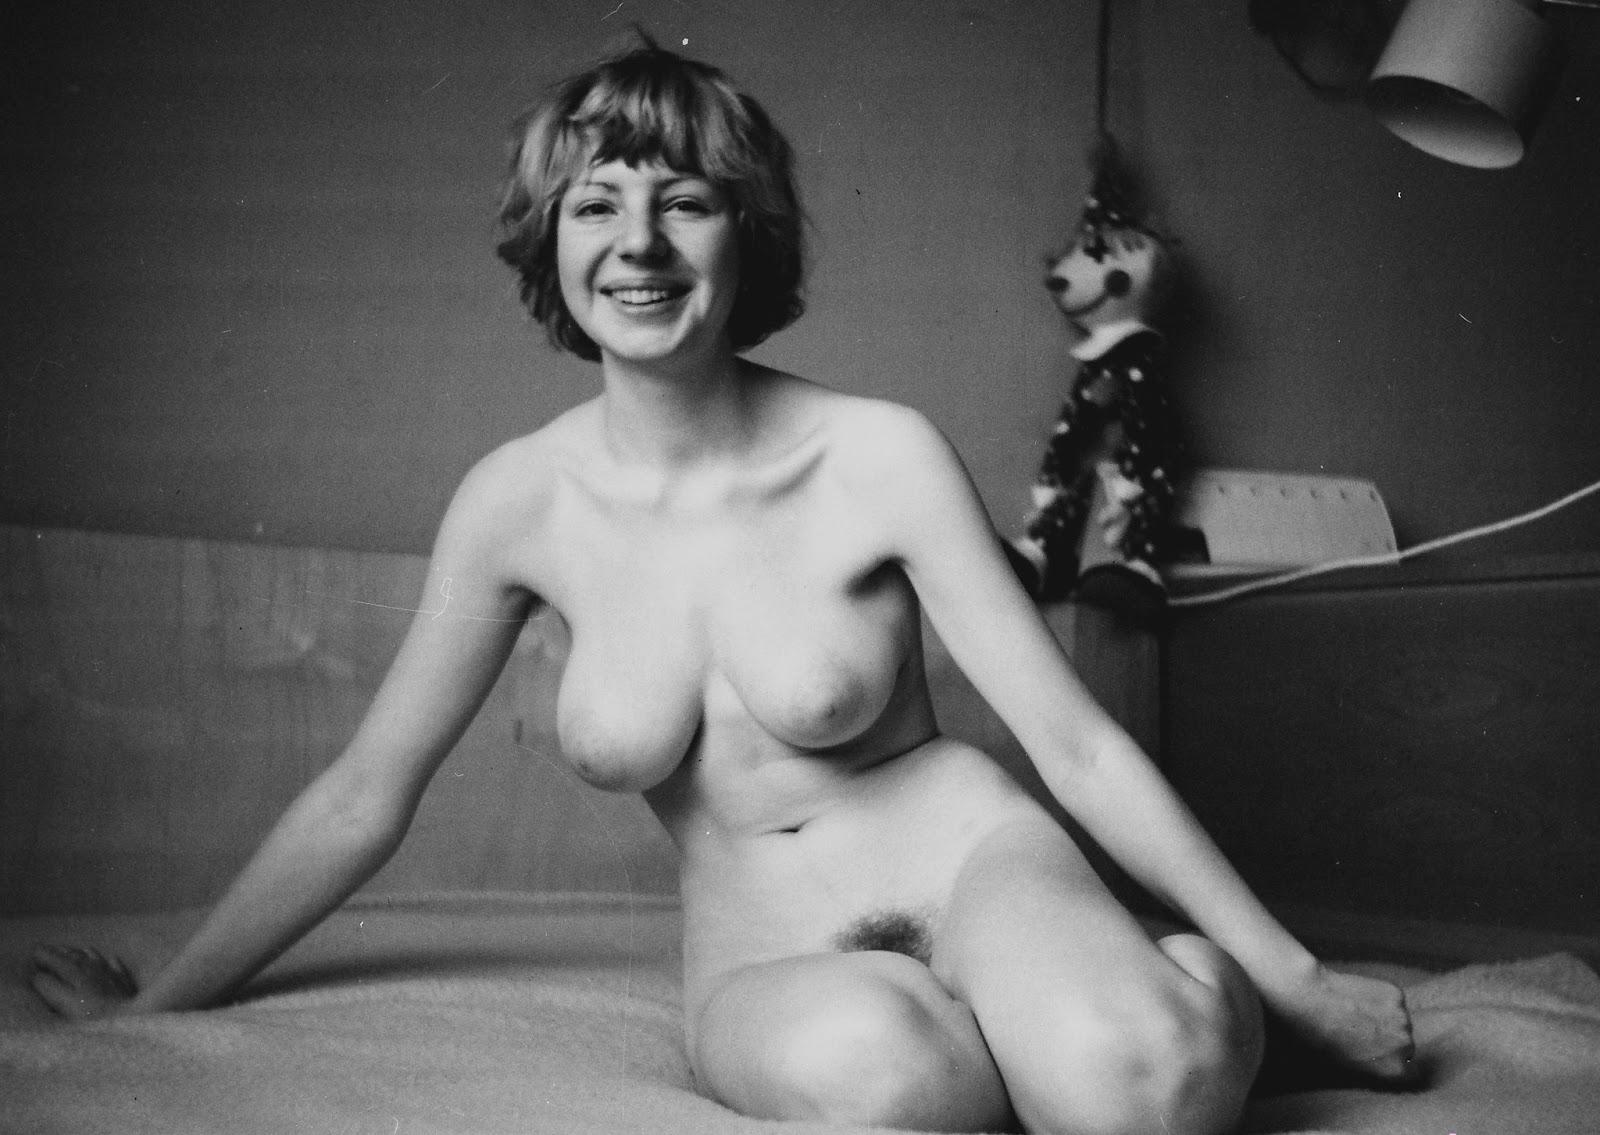 Jane Warner - Free Porn & Adult Videos Forum - Planet Suzy